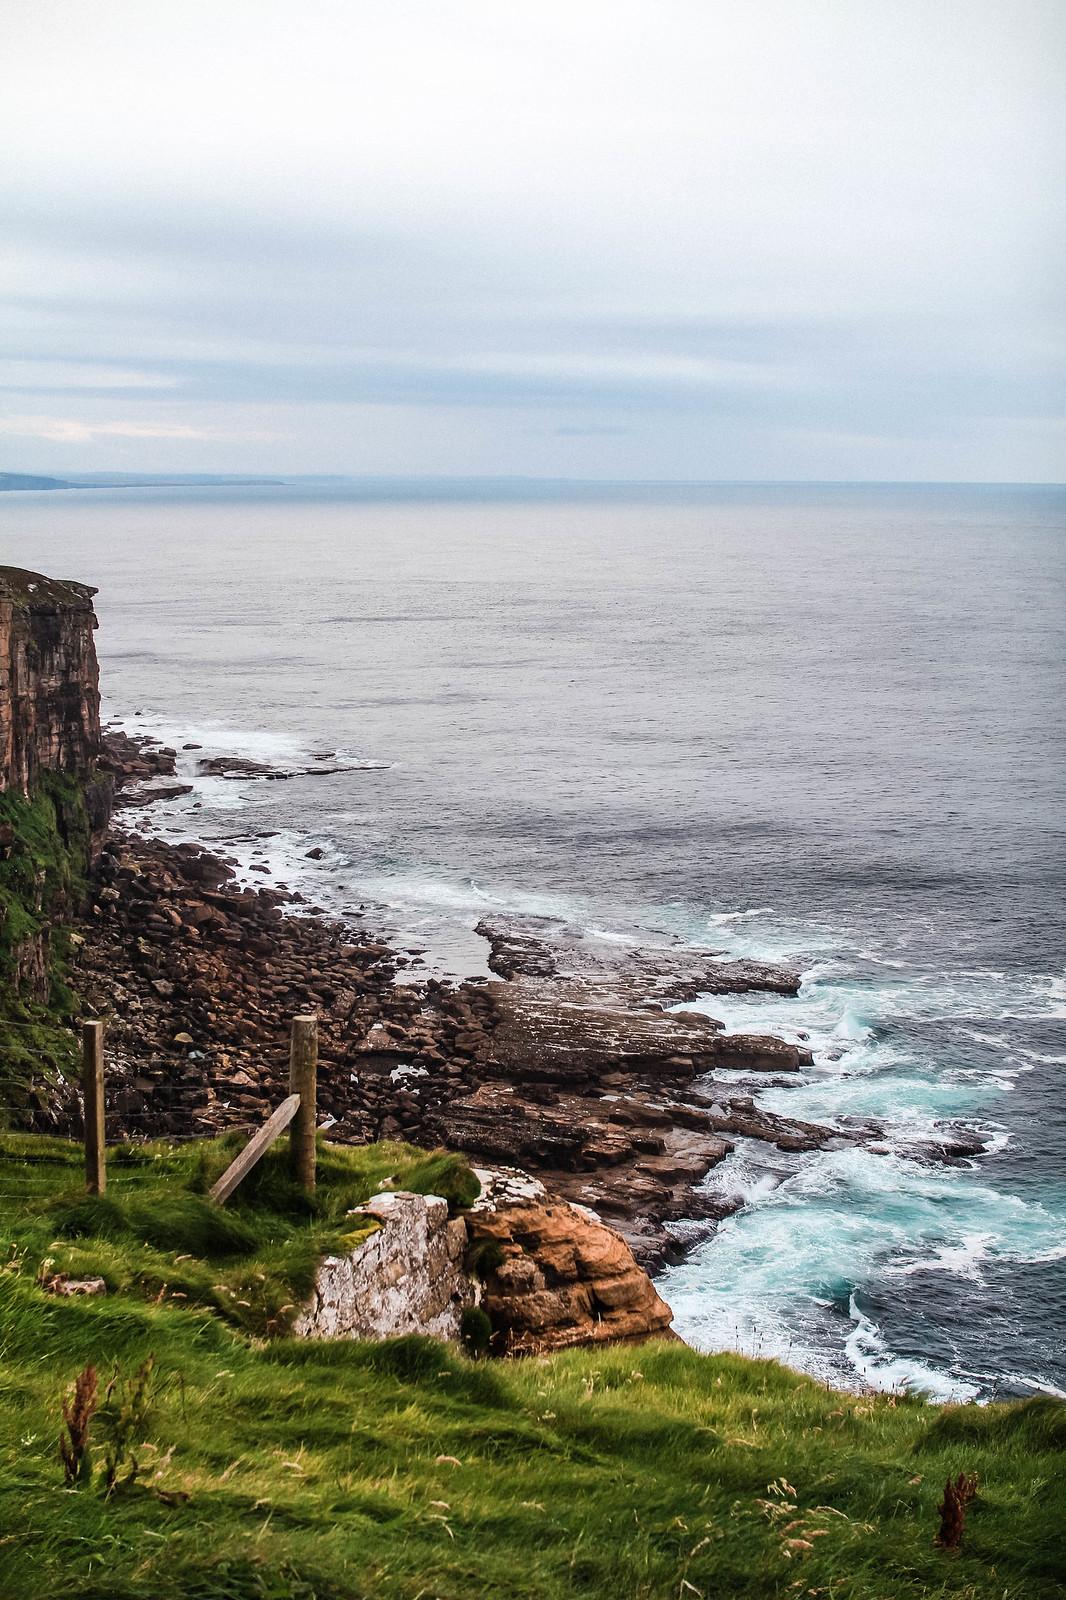 Dunnet Head Scotland NC500 best coastal views travel blogger UK